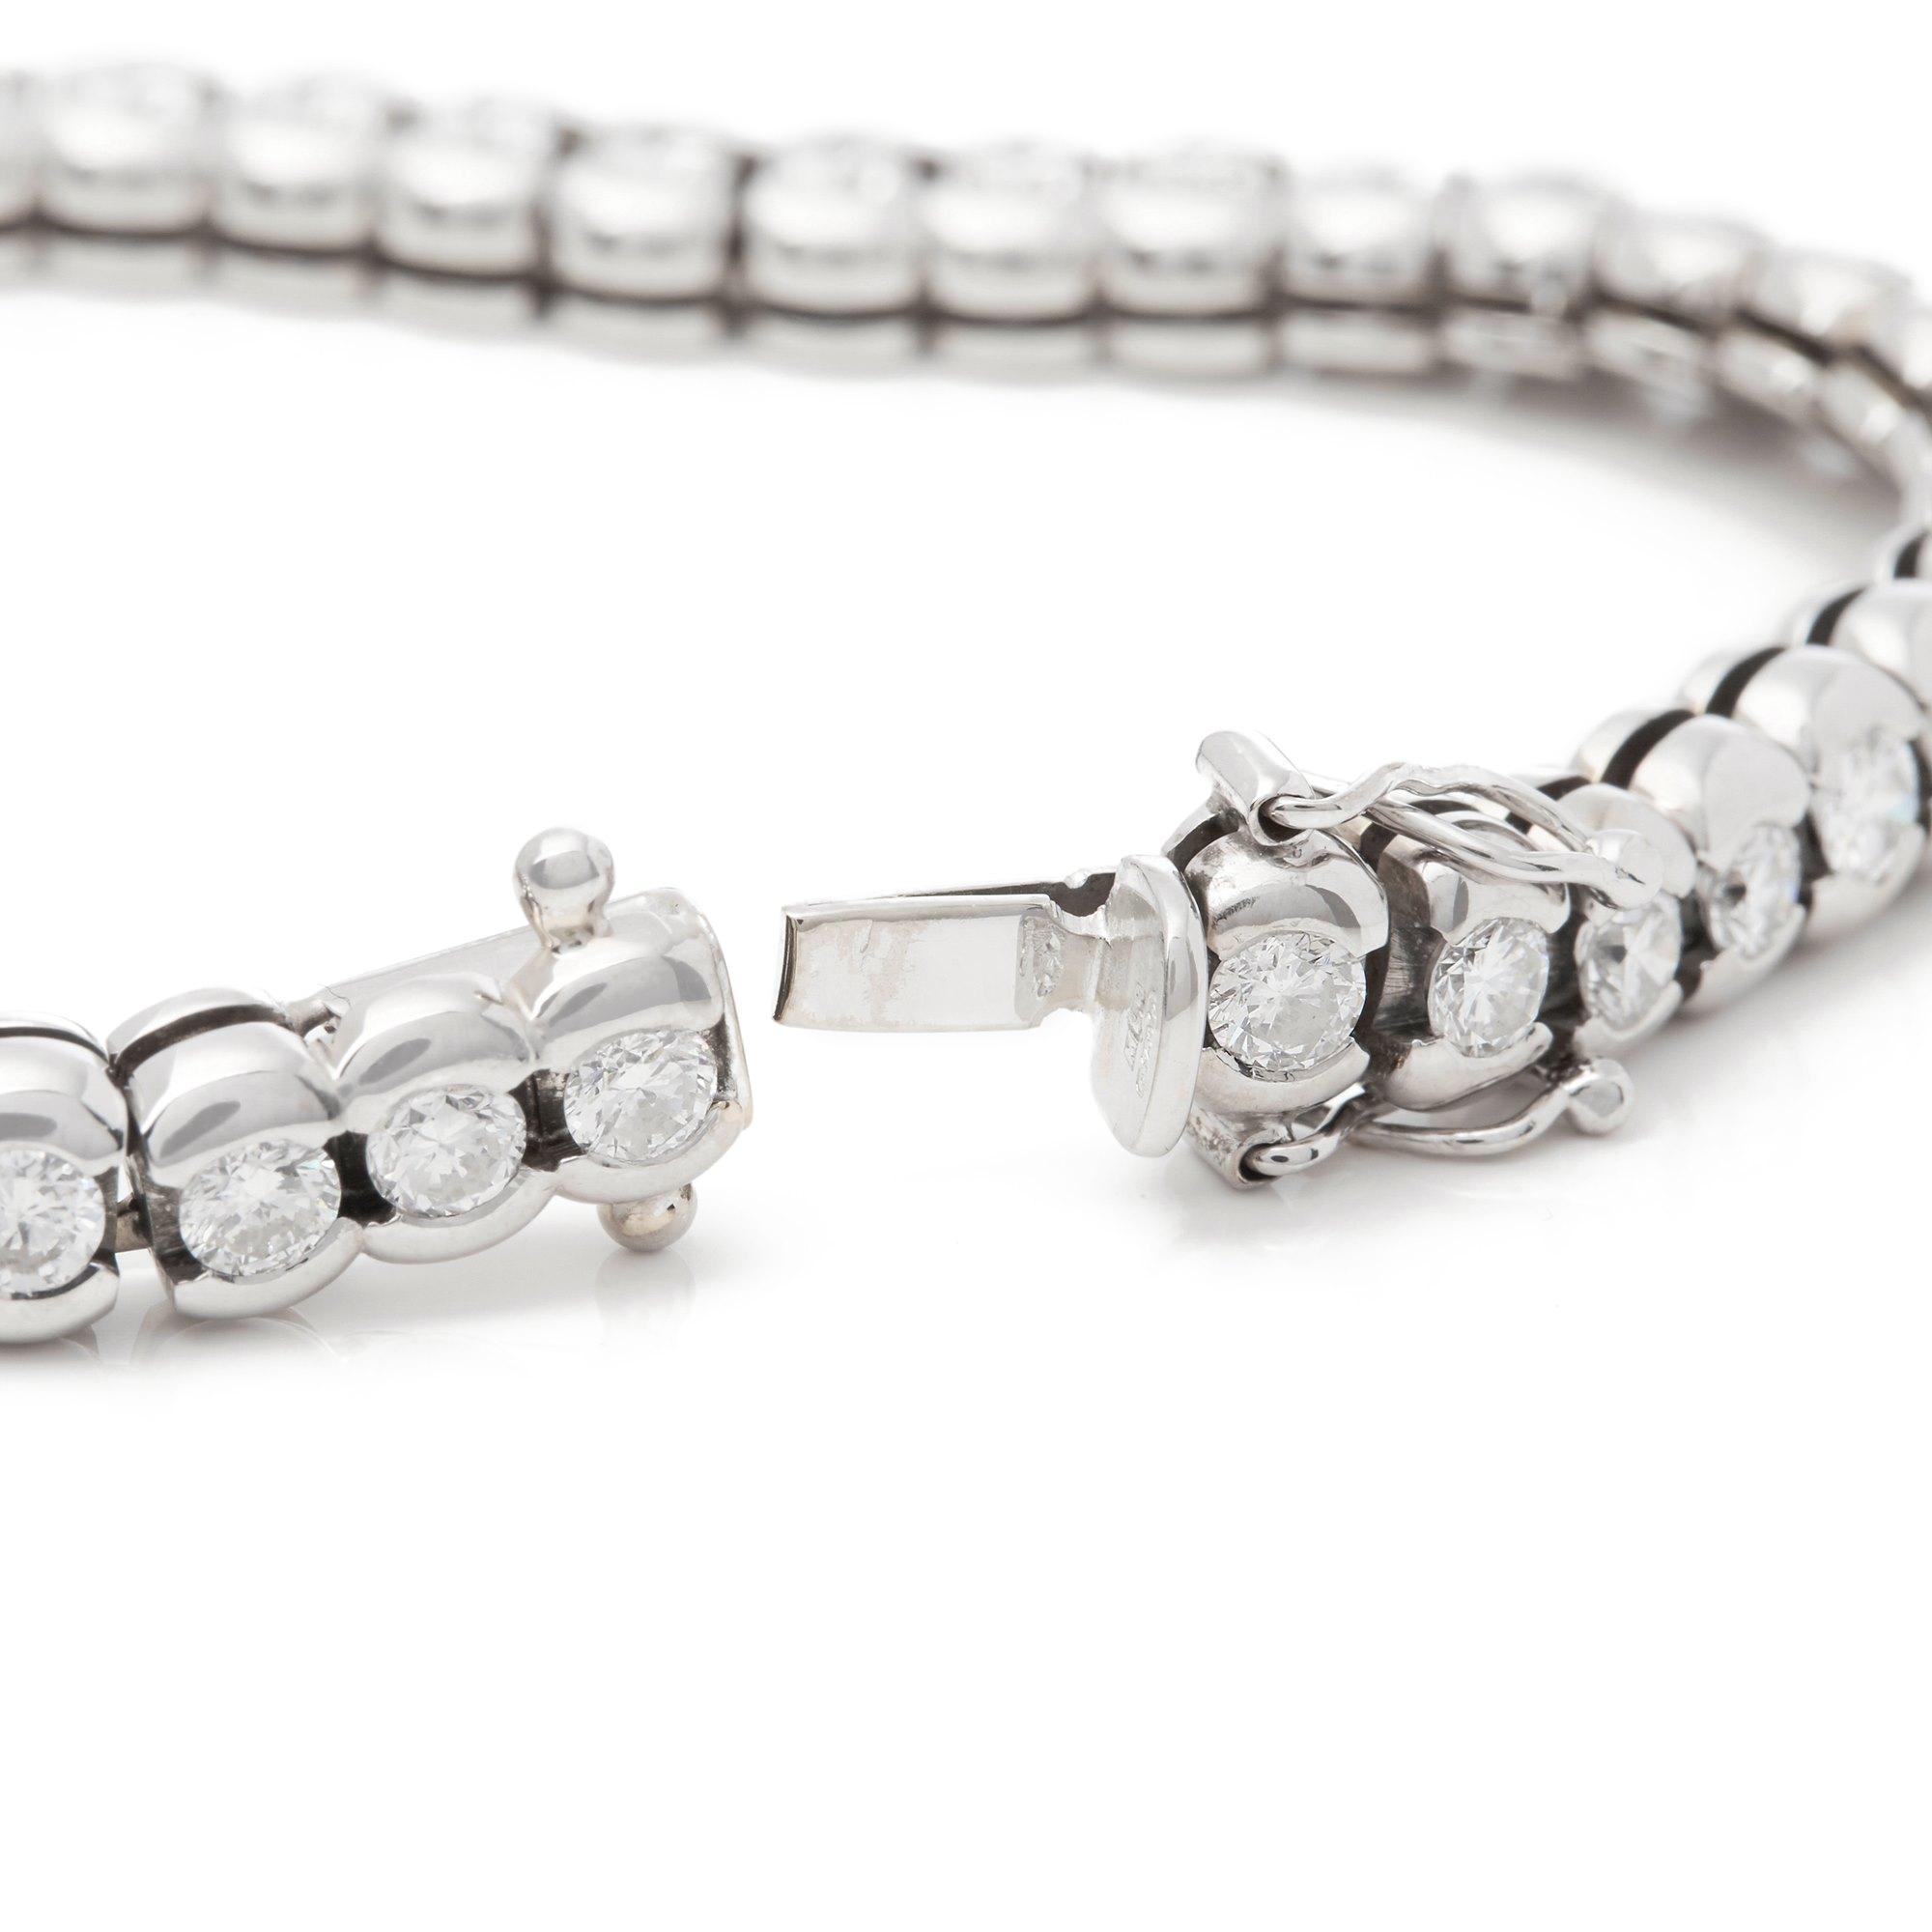 Diamond 18k White Gold 5.50ct Round Brilliant Cut Diamond Bracelet